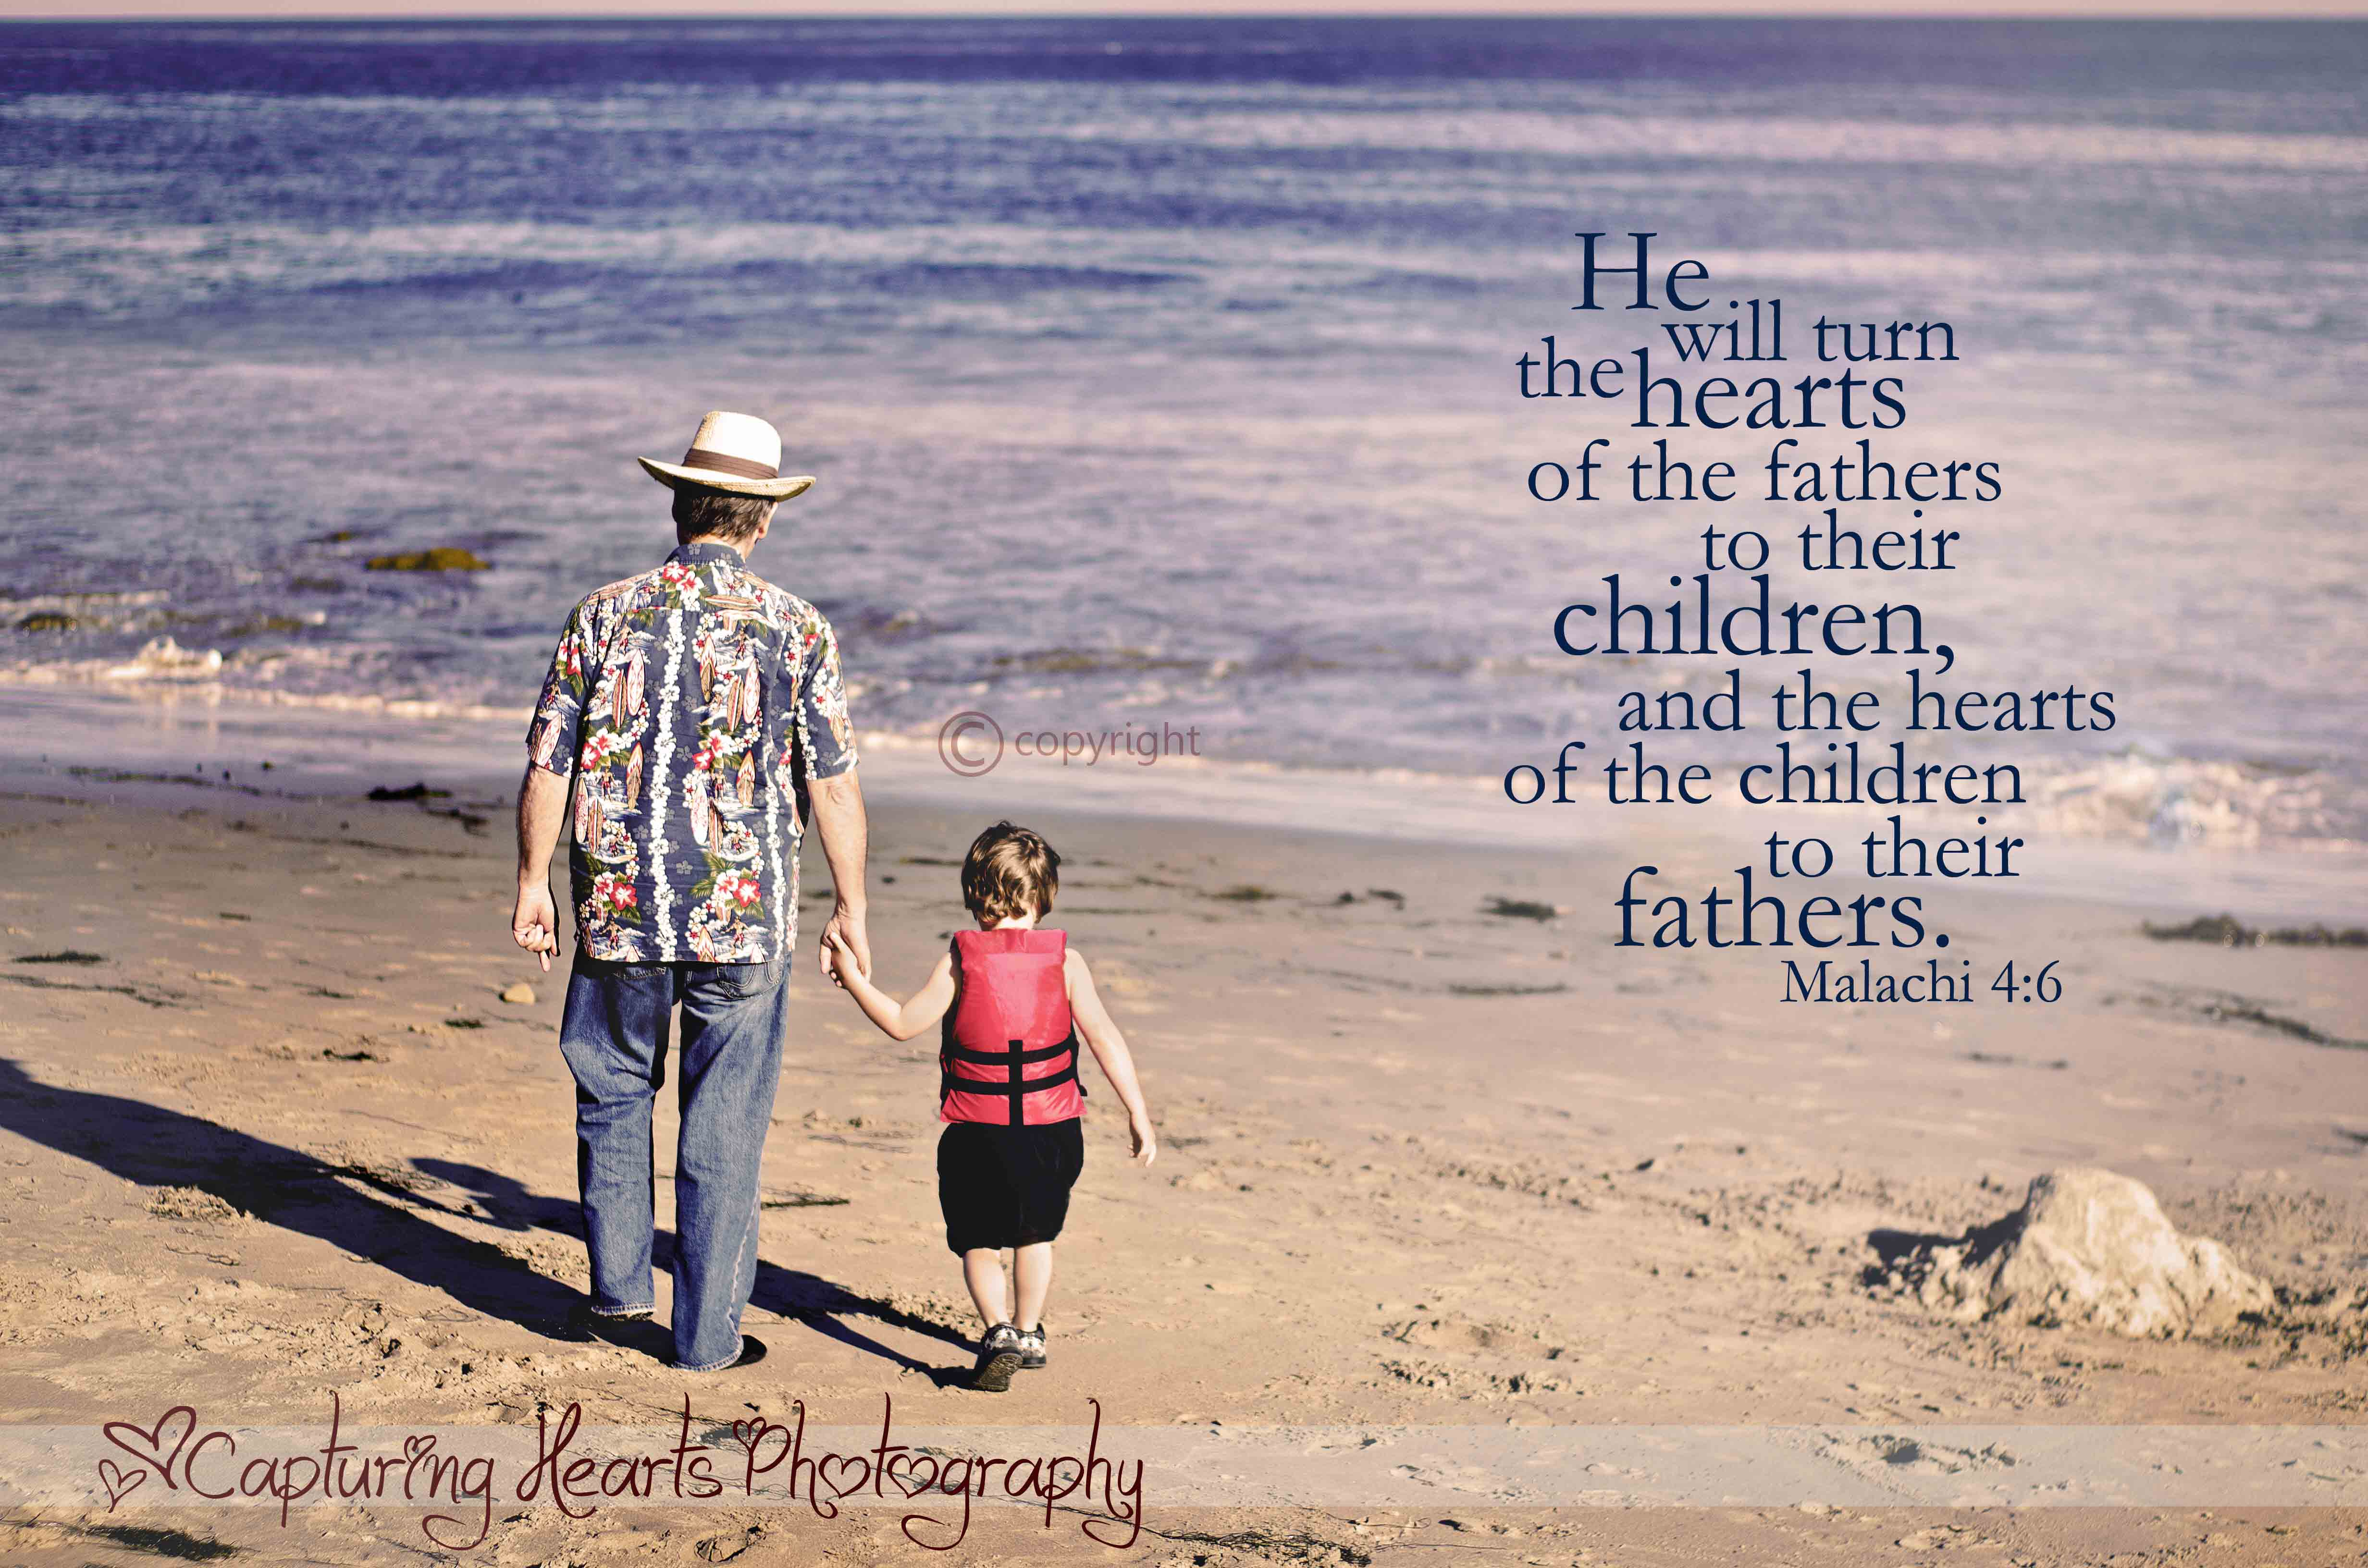 Beach+Photography+Mallibu+California+Bible+Verse+Photography+Father+son+walking+on+beach+COPYRIGHTLQ